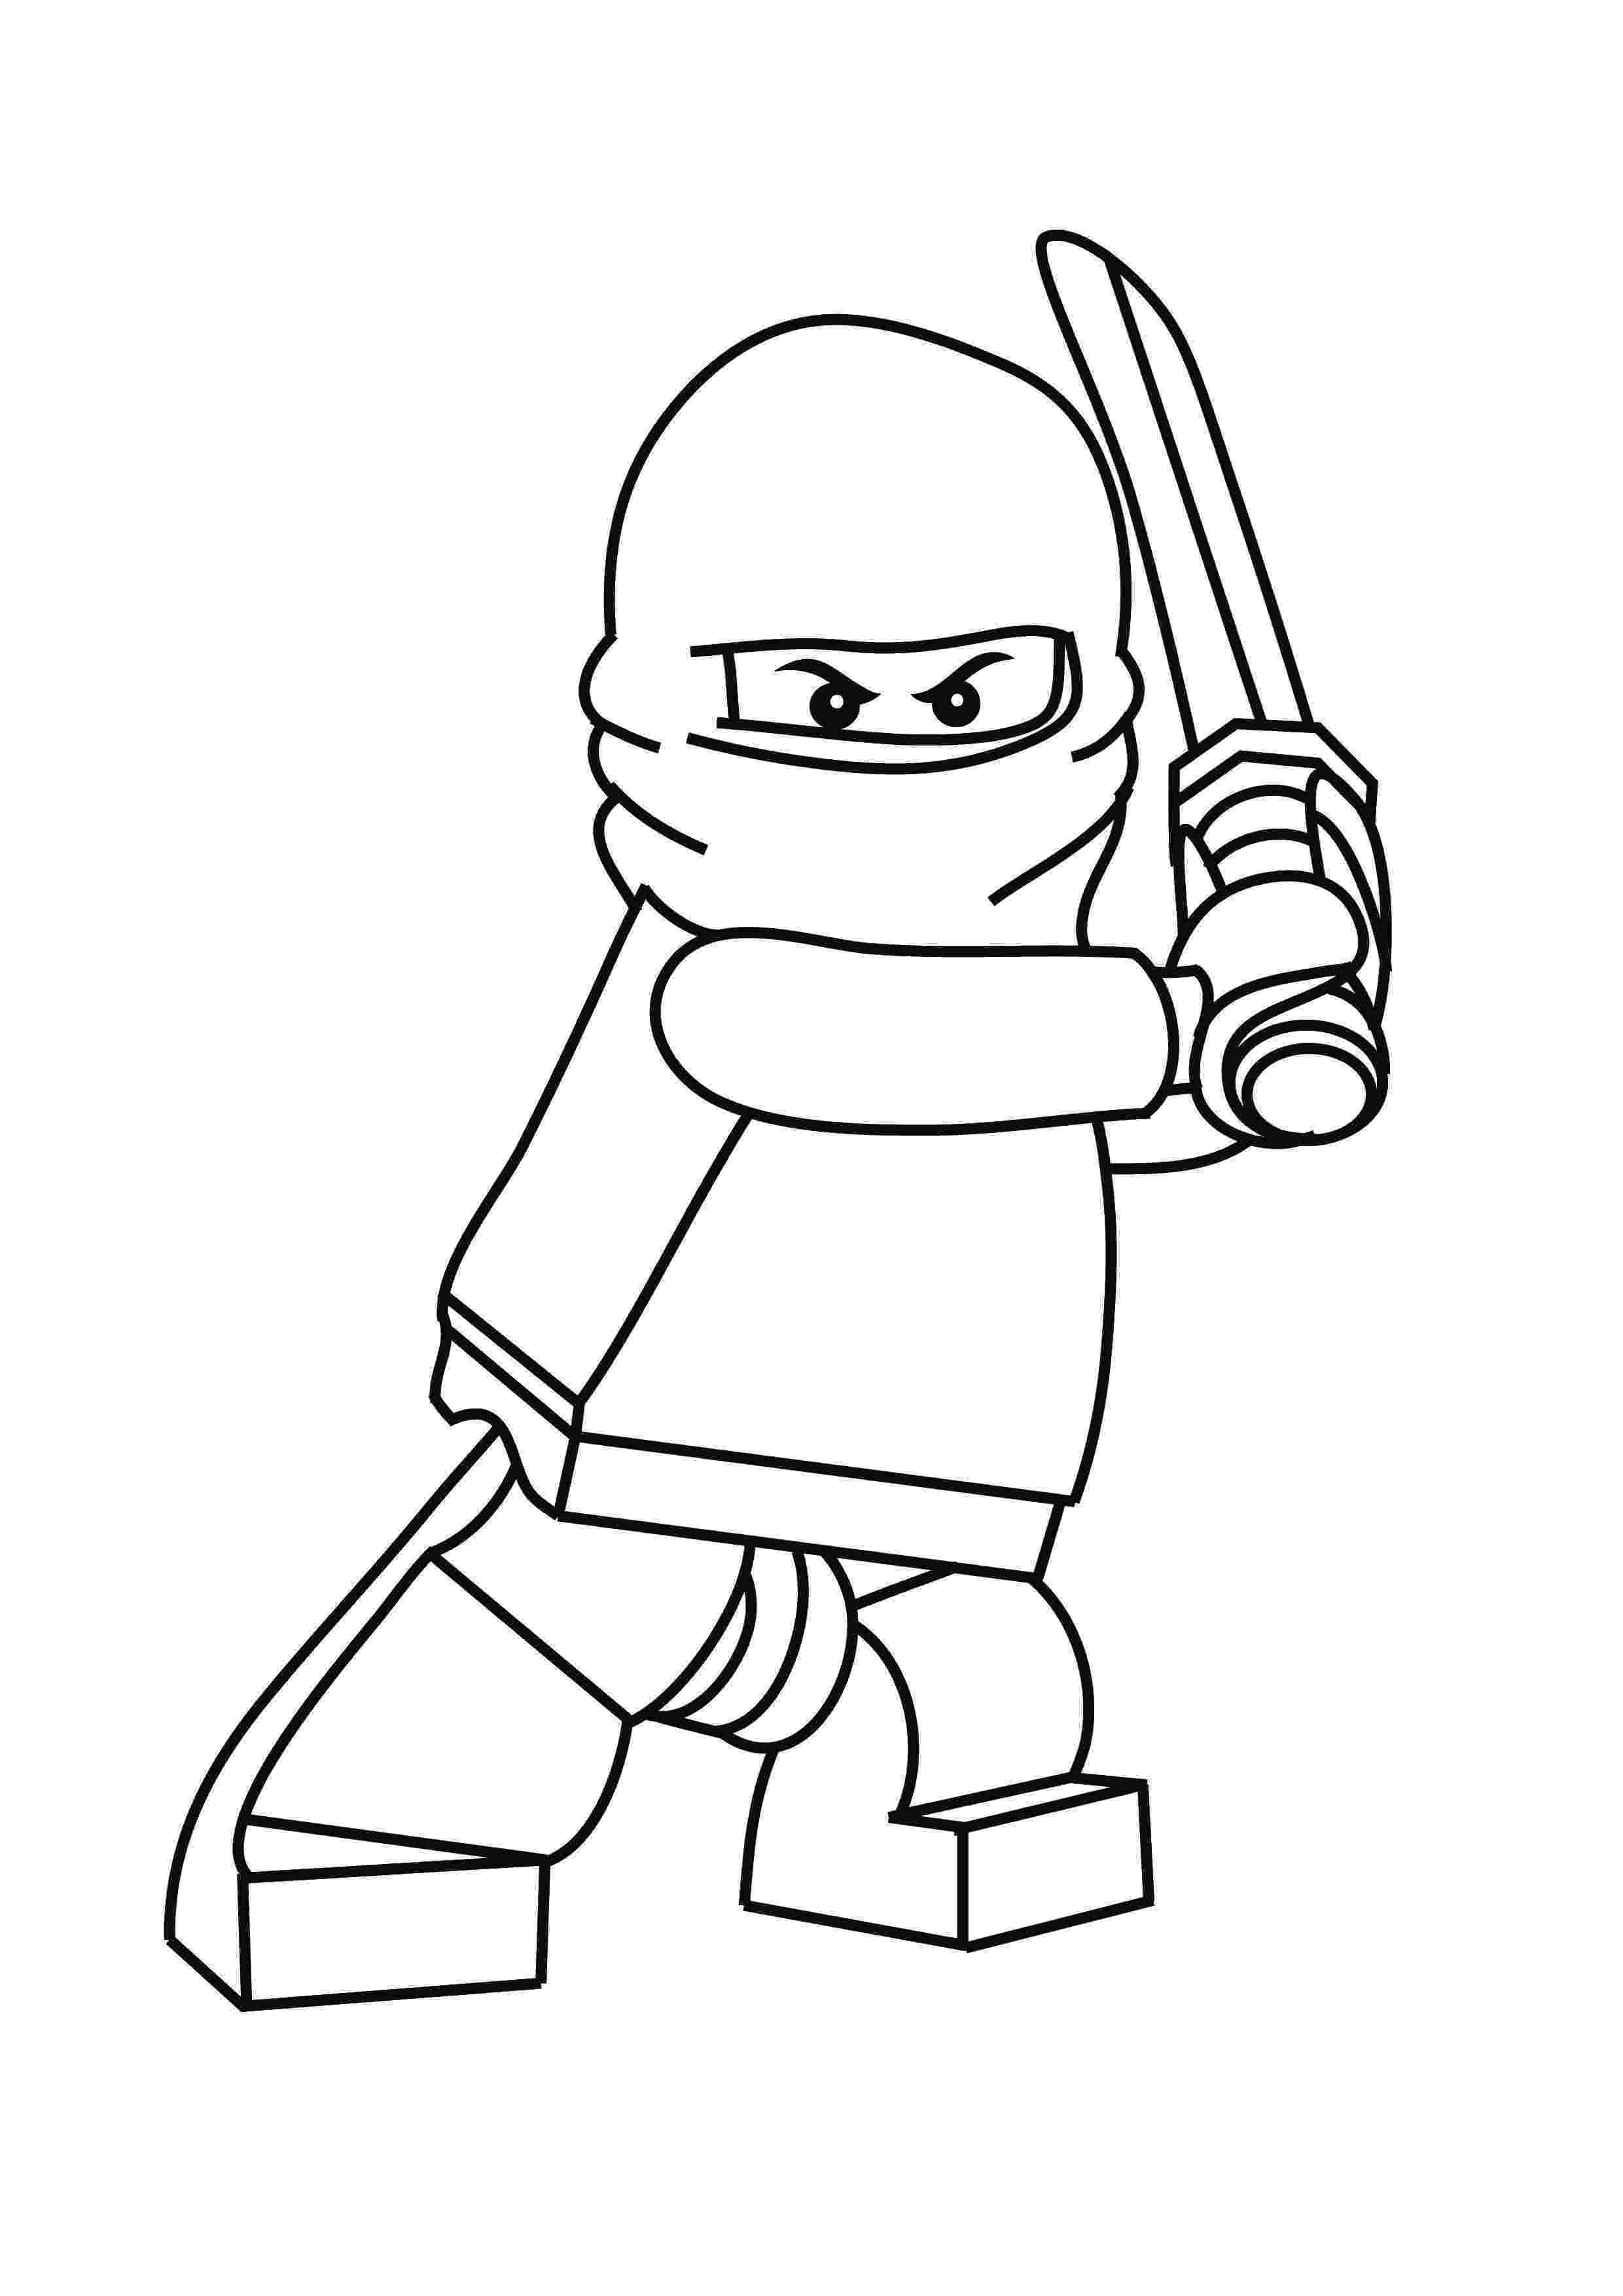 ninjago printables lego ninjago coloring pages best coloring pages for kids printables ninjago